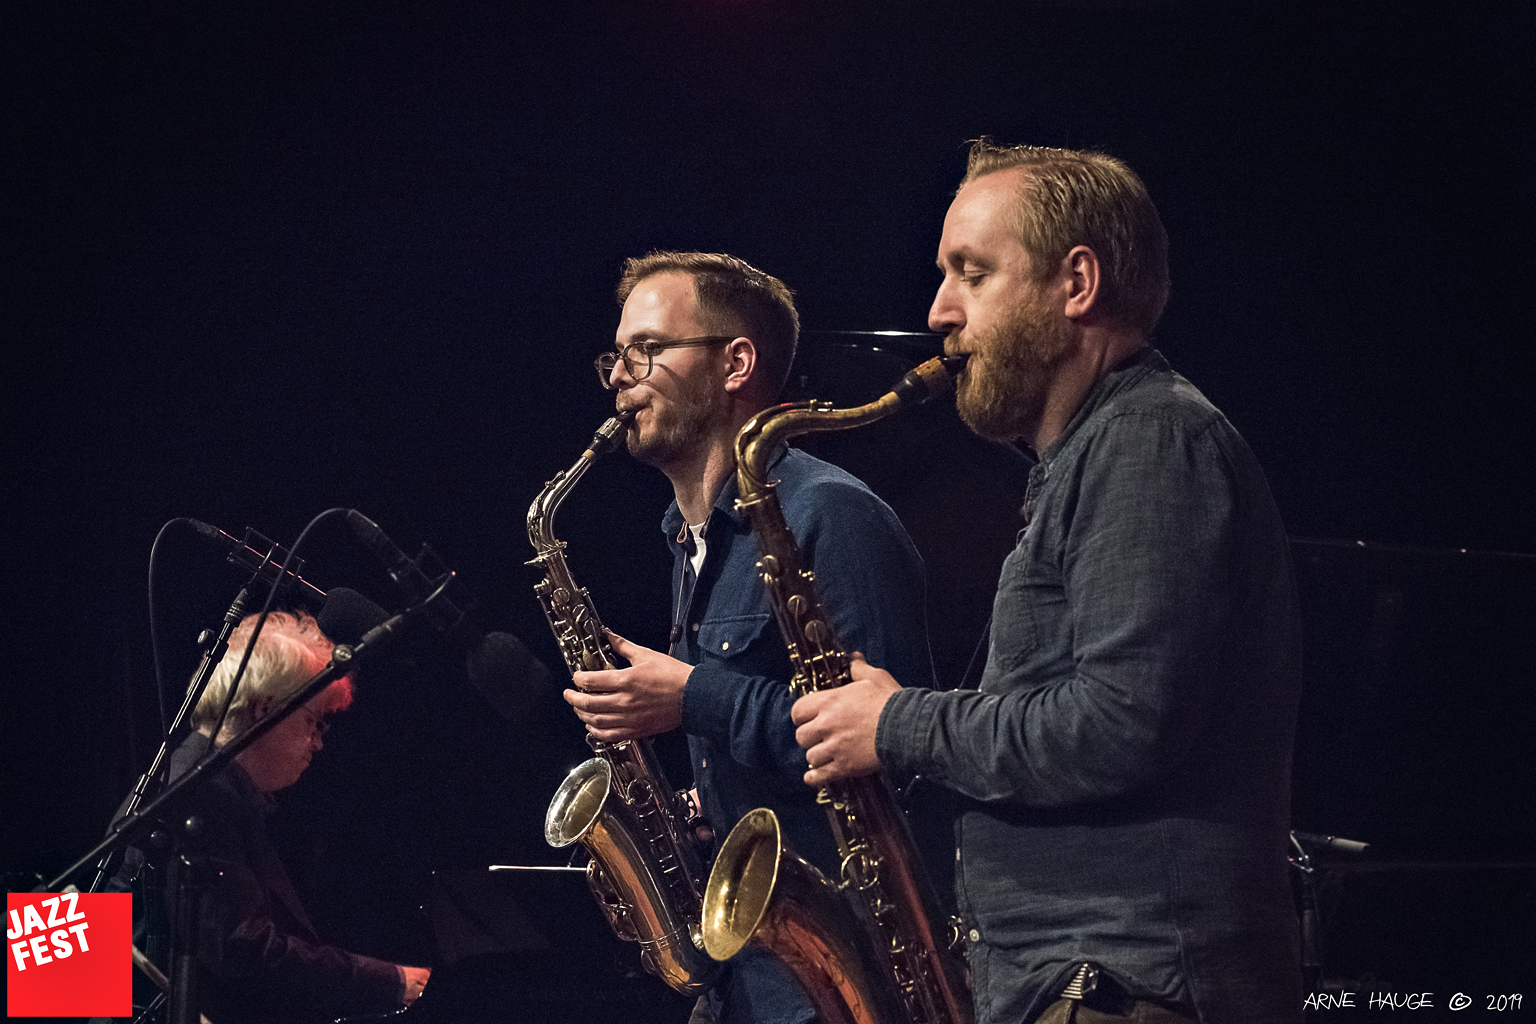 190509 Hegge (Jazz Expo) @ Dokkhuset - foto Arne Hauge_001.JPG